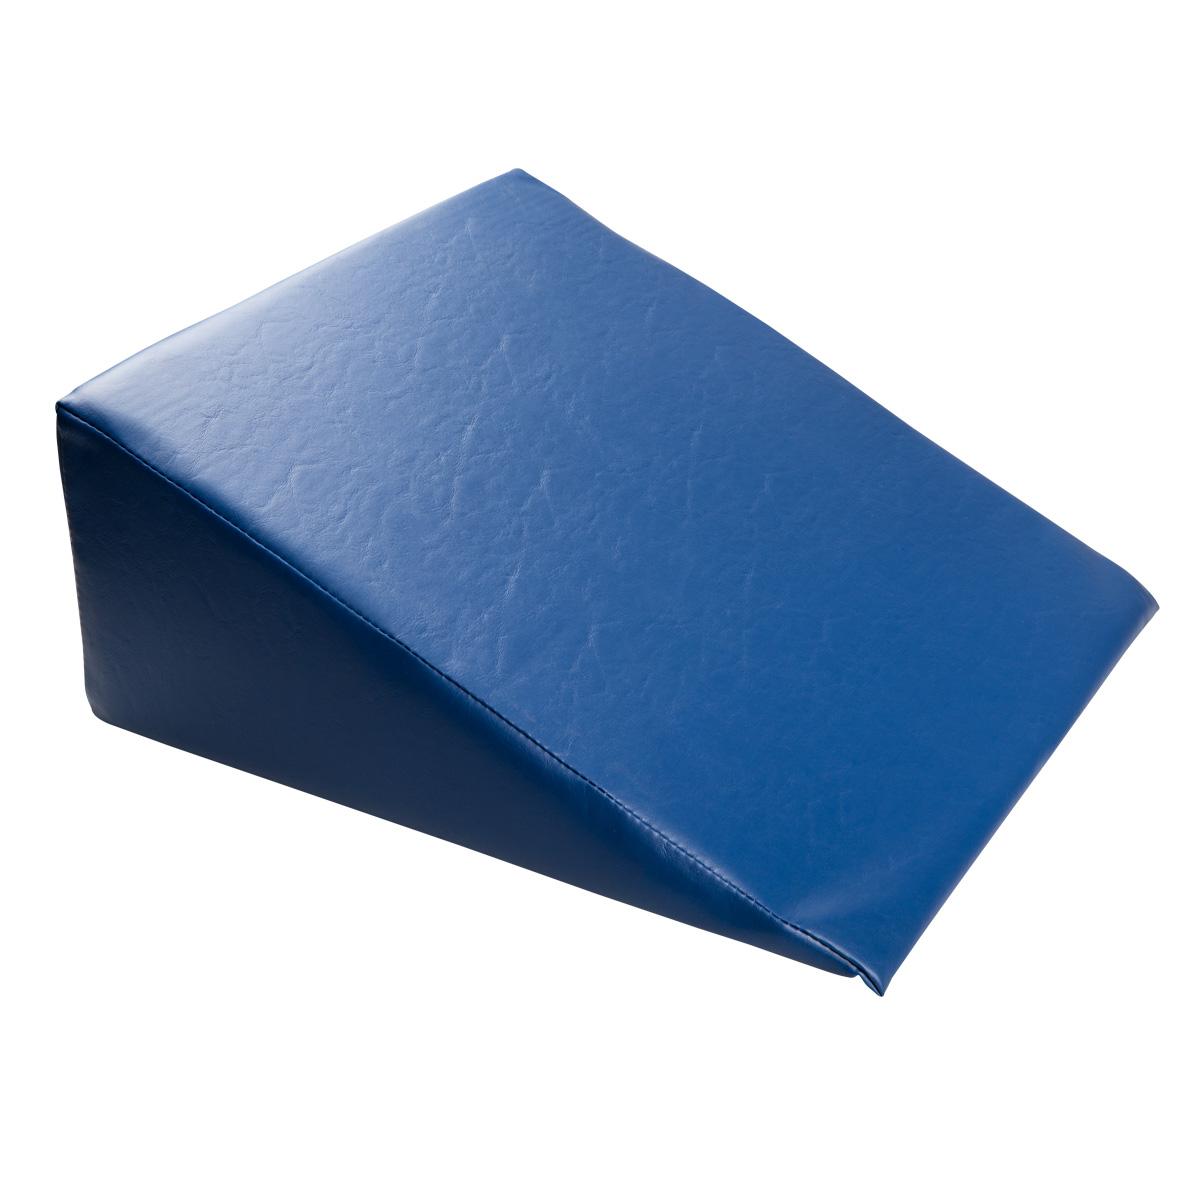 Cuscini Gommapiuma.Small Foam Wedge Pillow Pillows Bolsters Shoulder Wrap